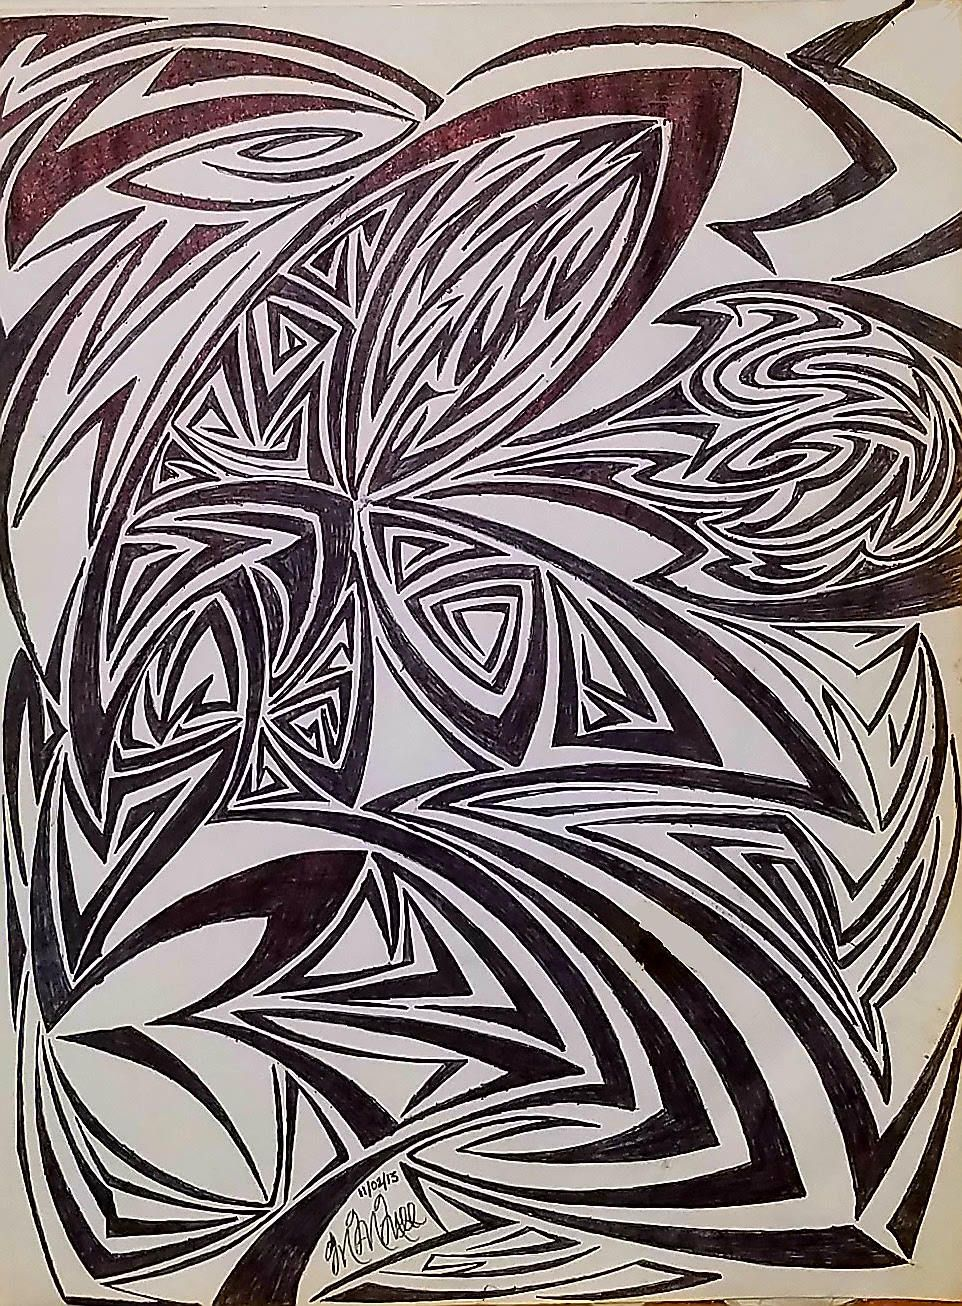 Original Abstract Modern Art Abstract Drawing Abstract Art Modern Drawing Geometrical Art By Marcmcmil Abstract Drawings Modern Drawing Modern Art Abstract